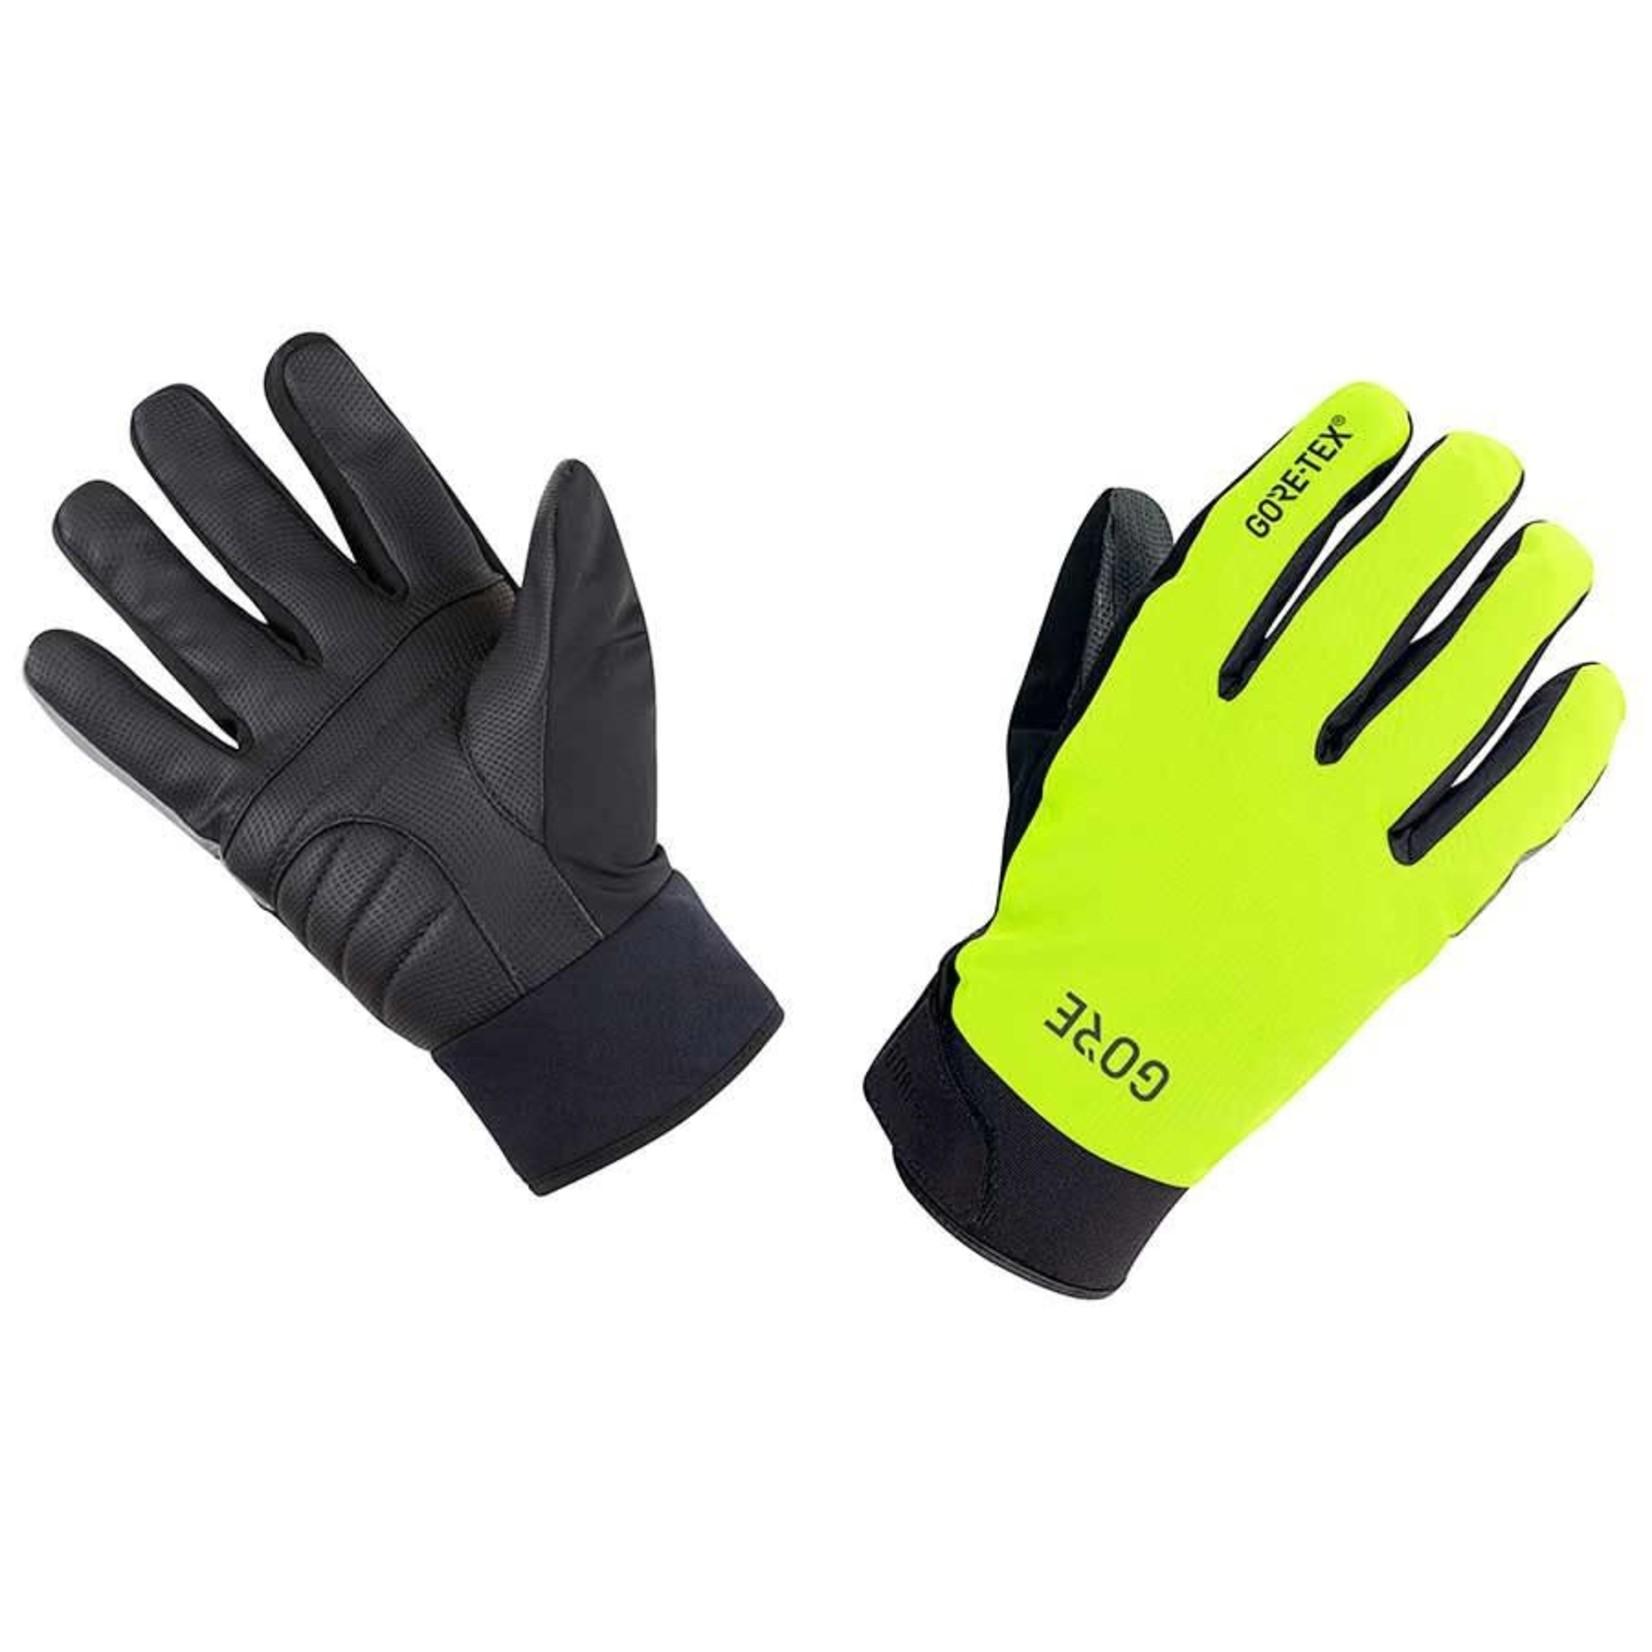 Gore Wear Gore Wear C5 Thermo Gloves